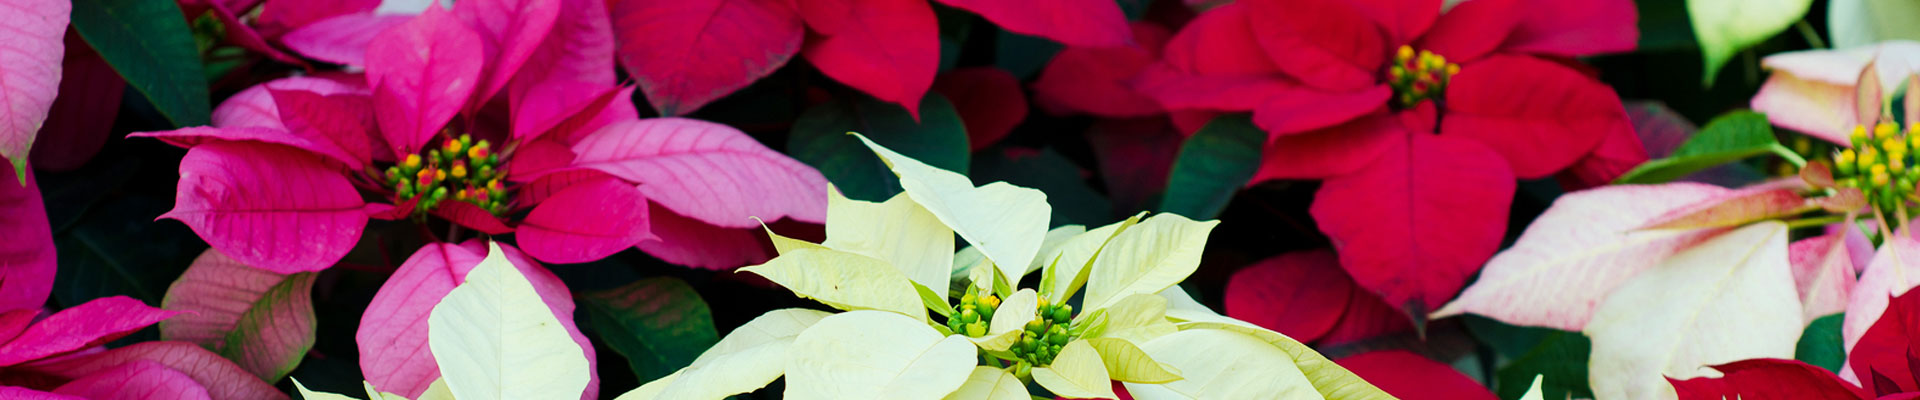 Christmas Houseplants